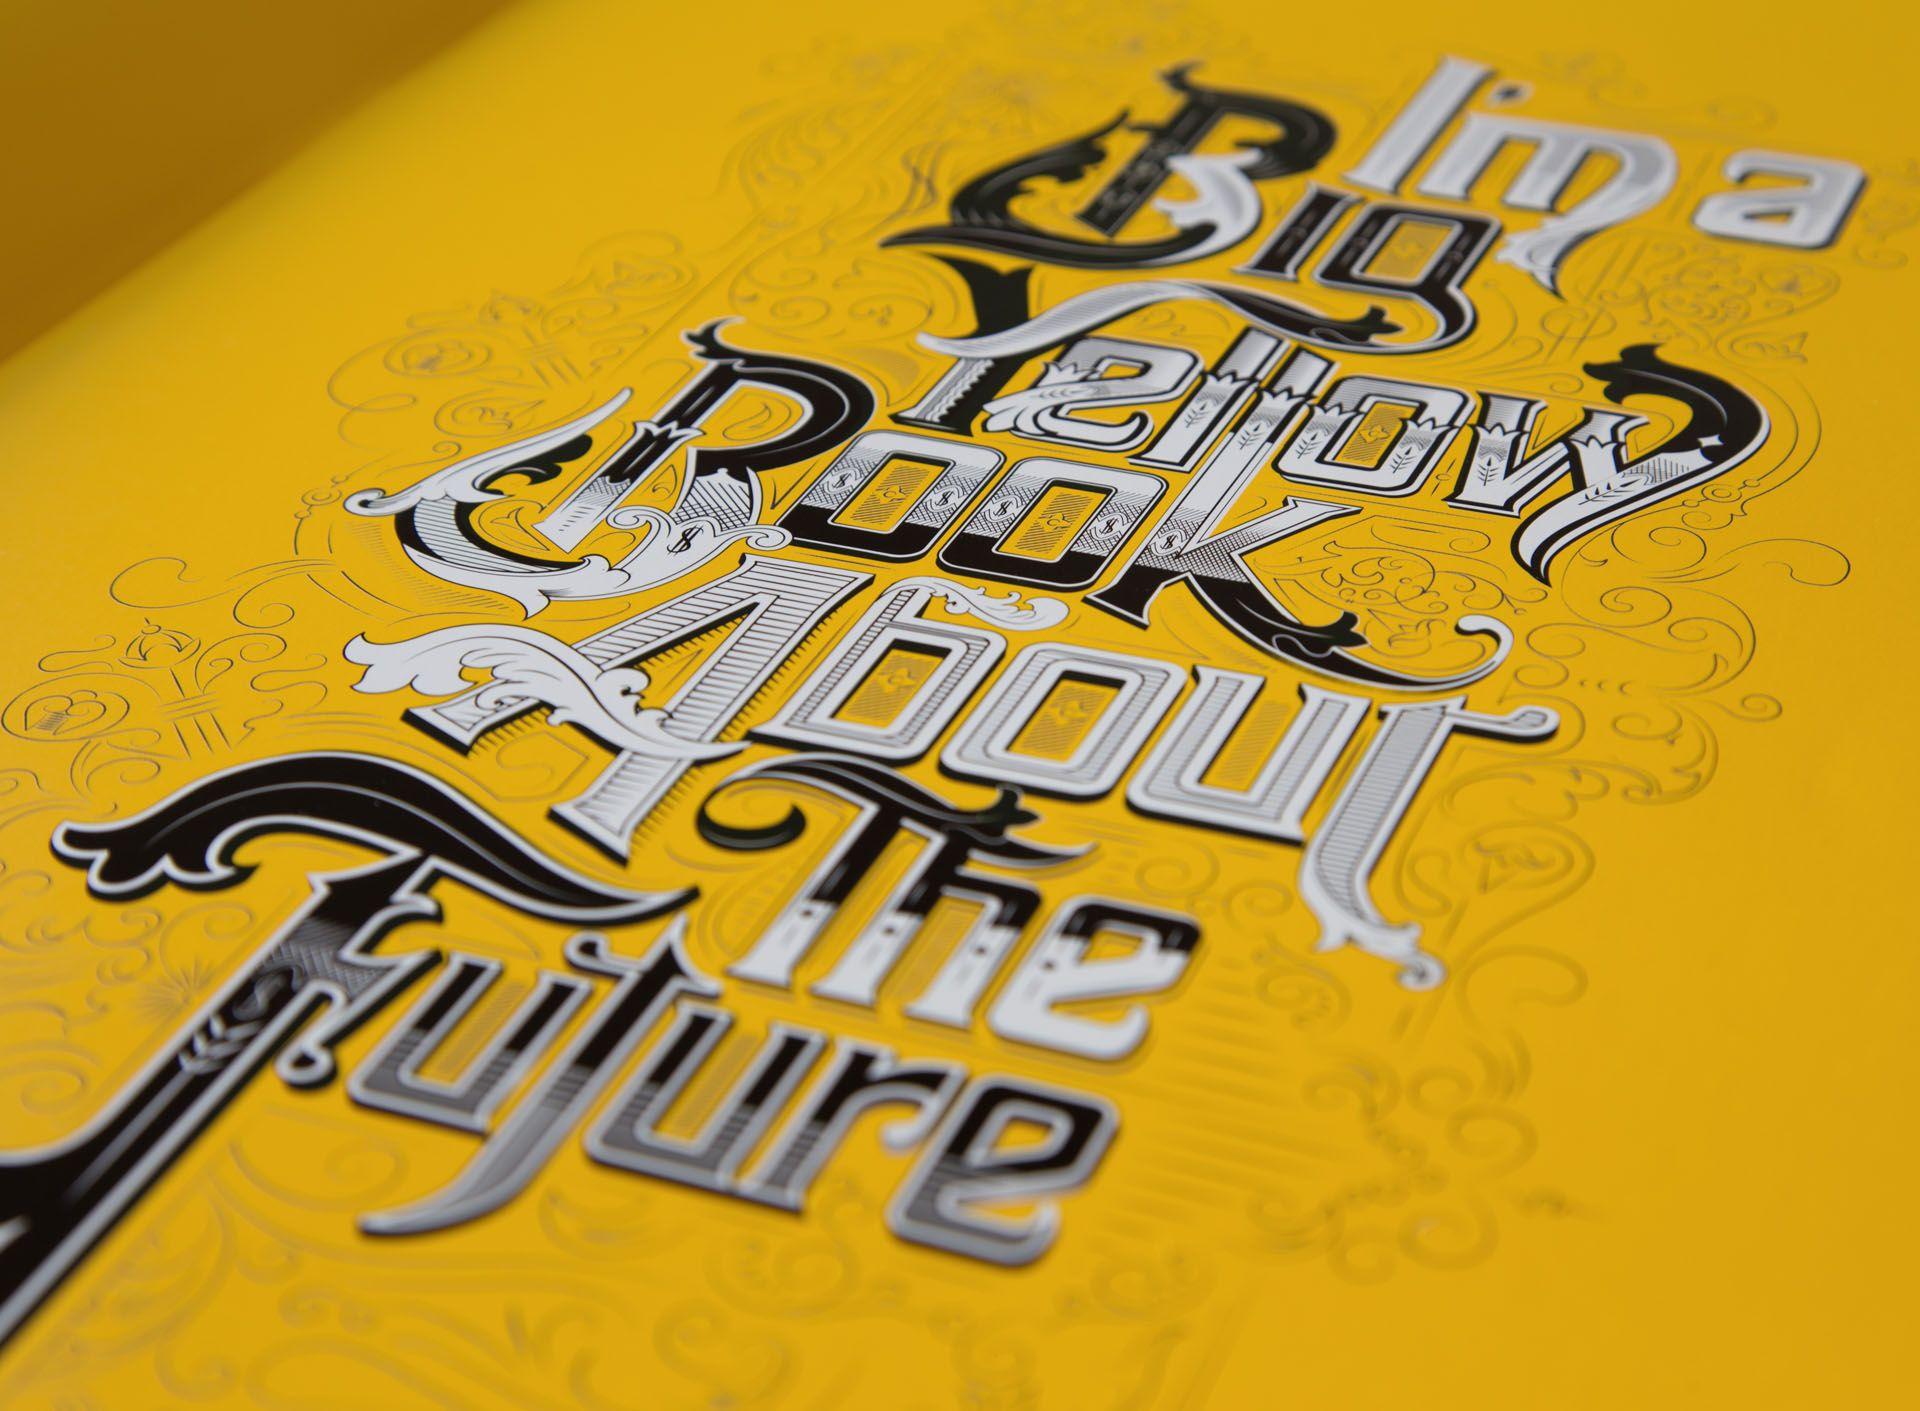 ASB - Book design, graphic design, typography, custom, CGI, pop up.